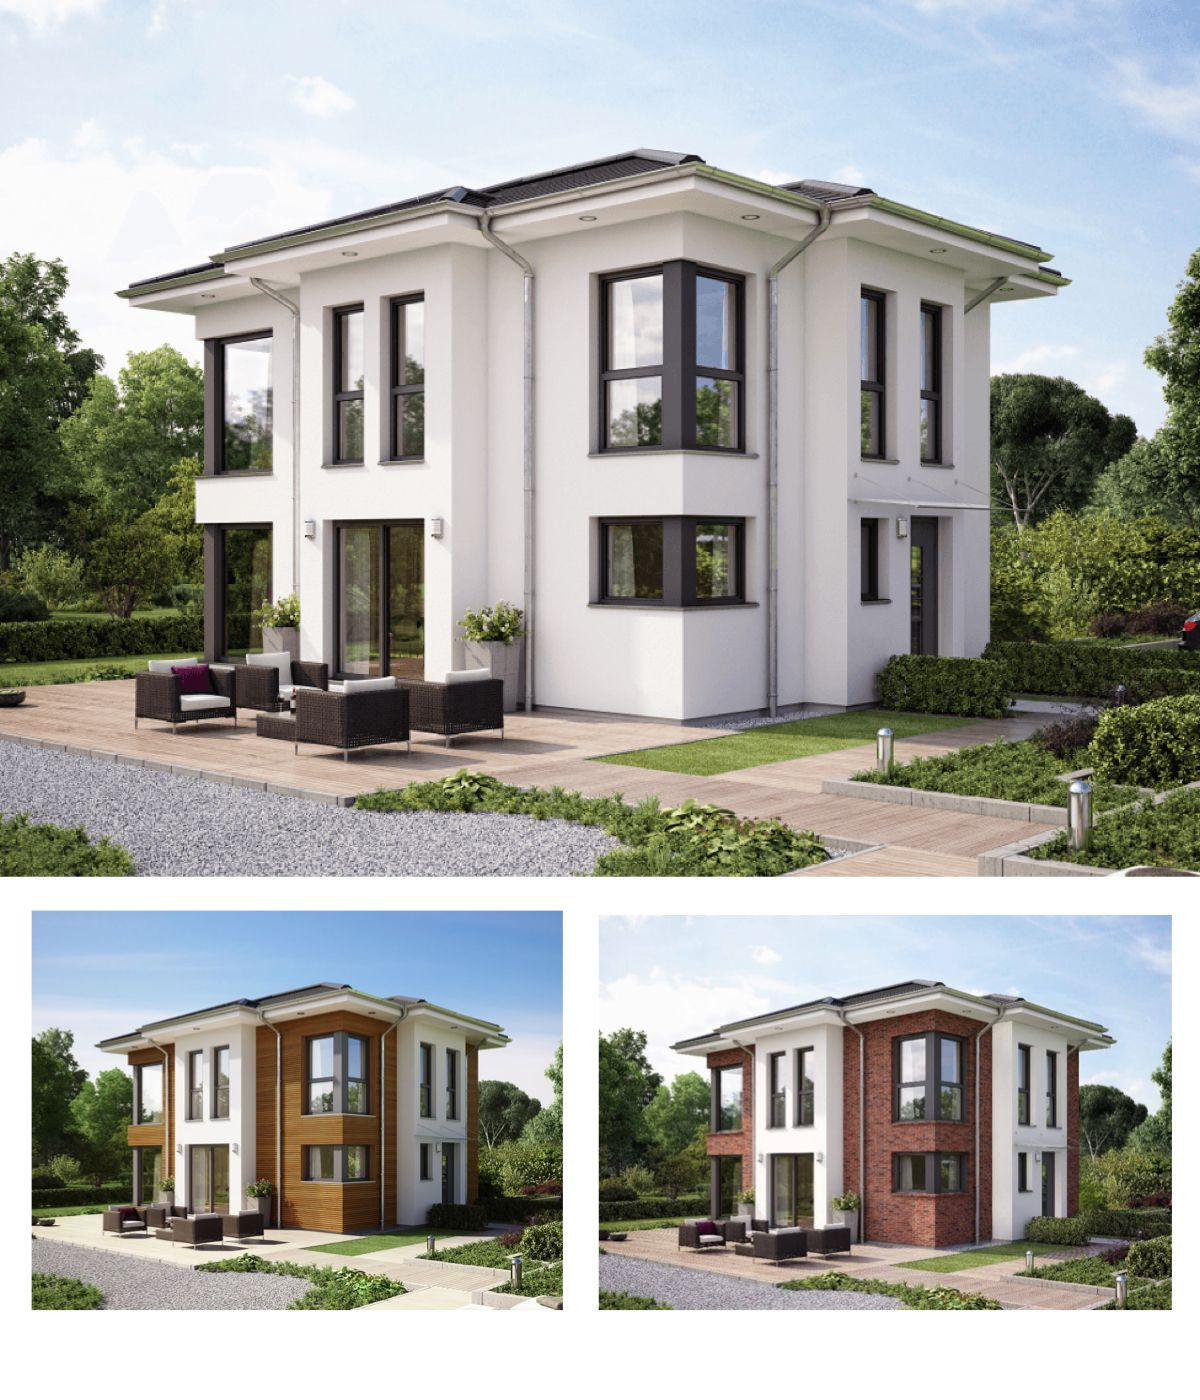 moderne stadtvilla fertighaus haus evolution 122 v14 bien zenker wohnzimmer dekoo